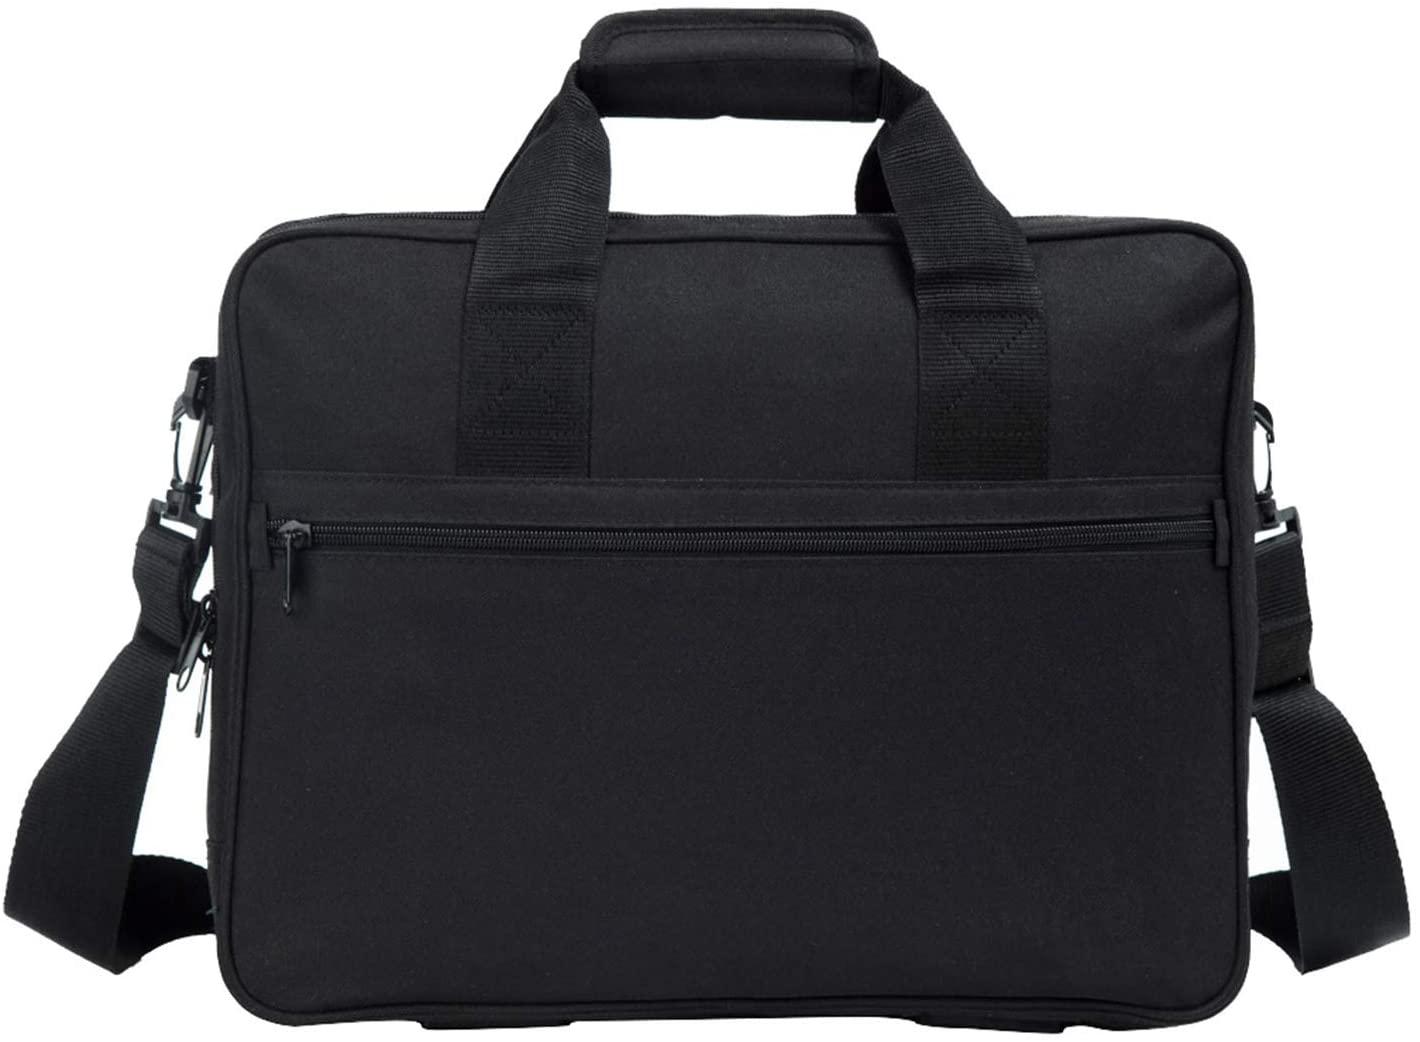 15.6Inch Laptop-Bag Business Briefcase Travel MessengerShoulder Bag Waterproof Computer Carrying Case Black